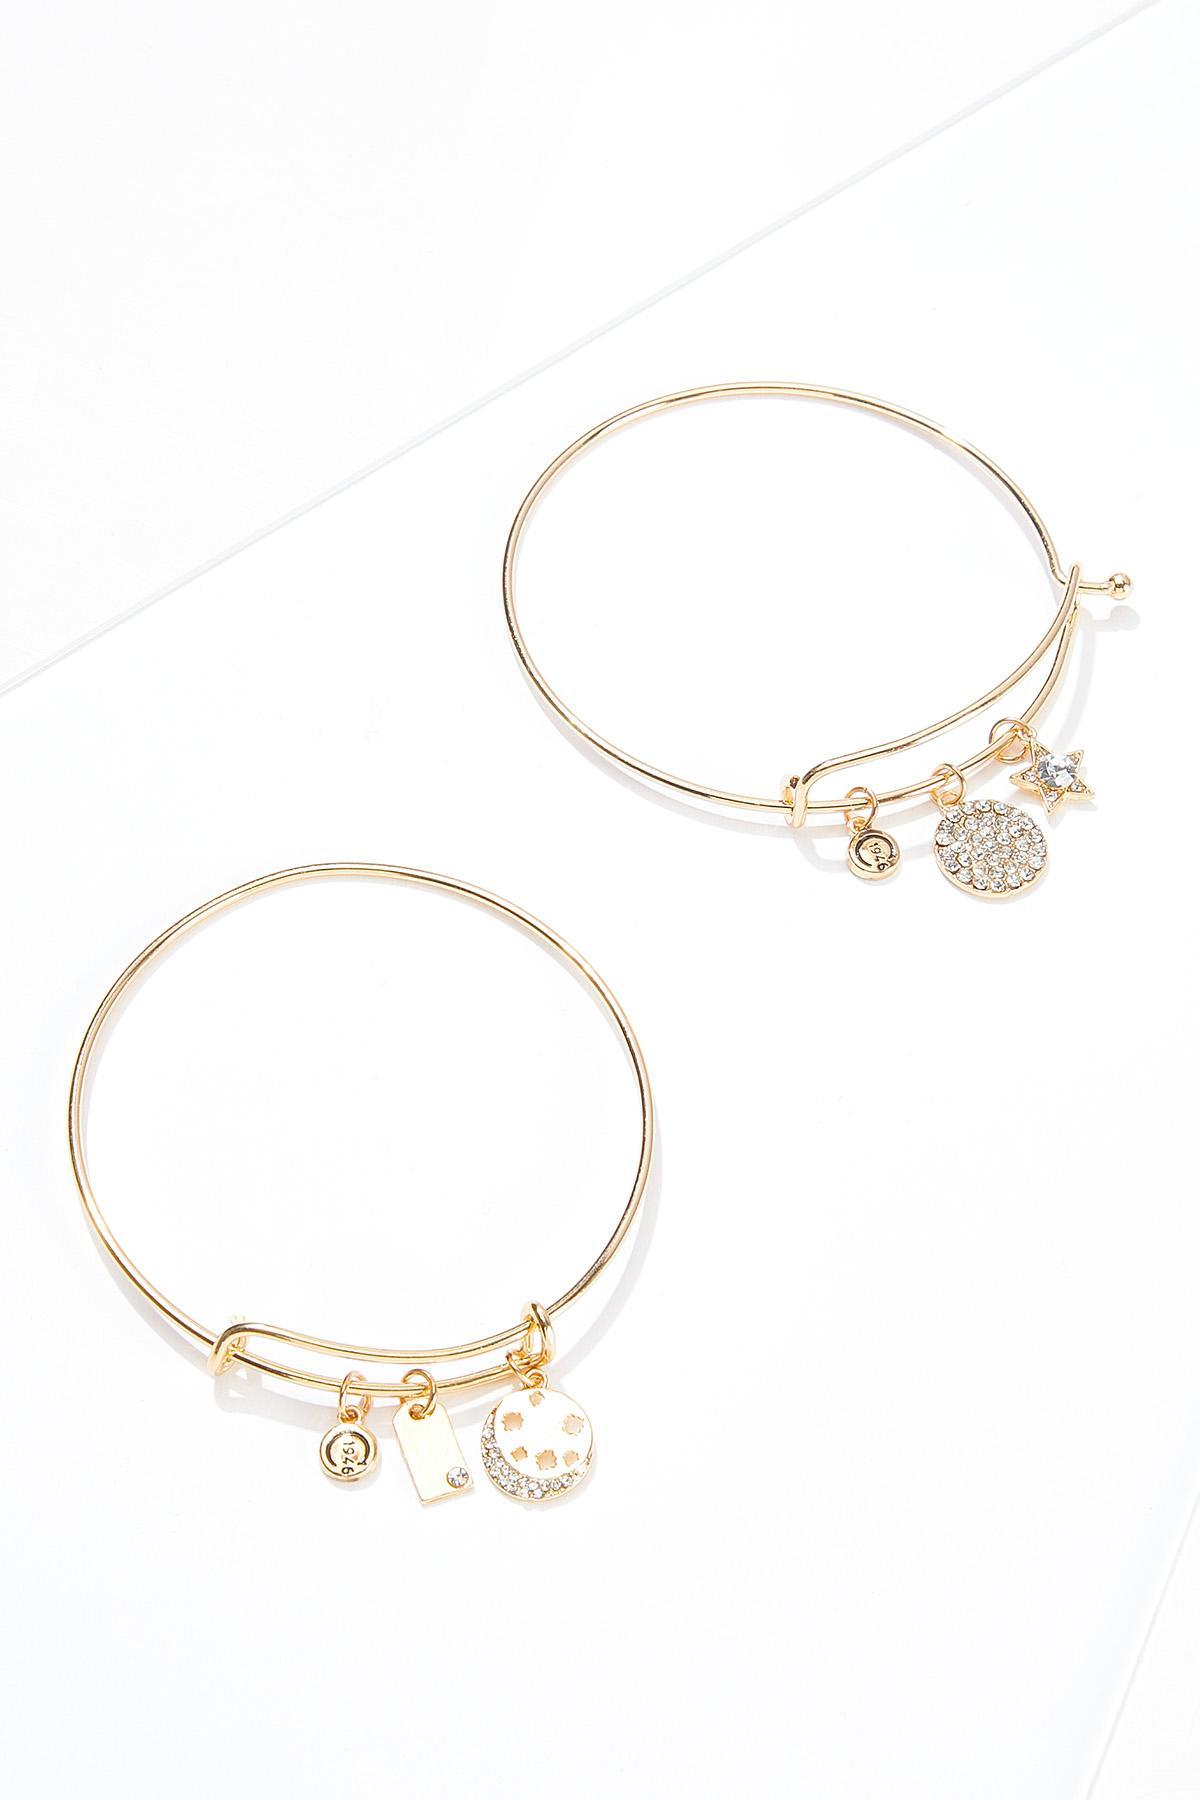 Celestial Charm Bracelet Set